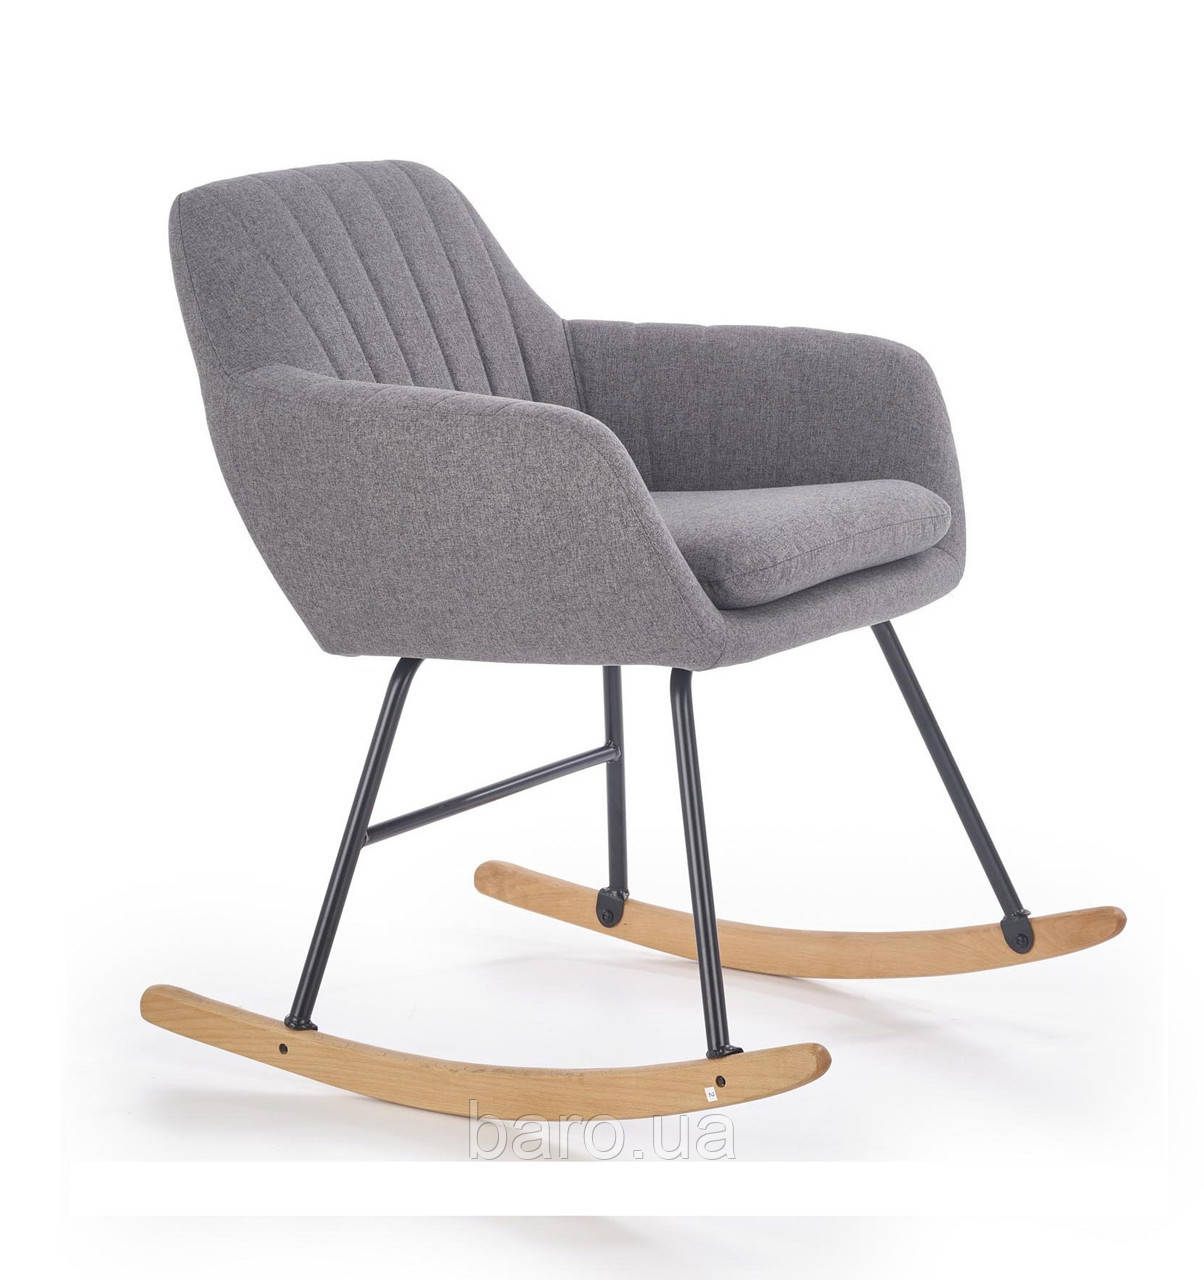 Кресло-качалка York (Йорк) серый, ткань, Halmar